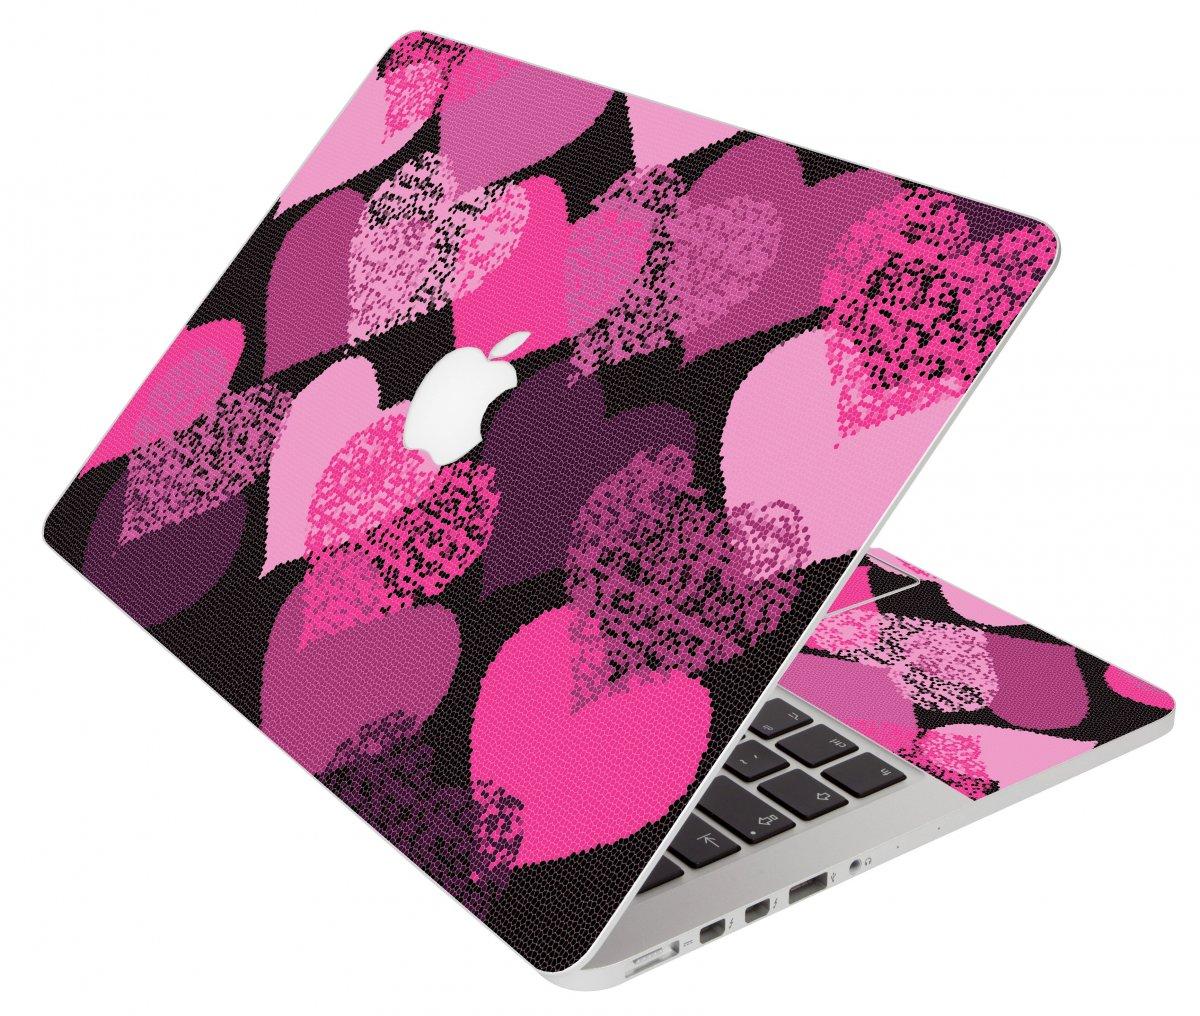 Pink Mosaic Hearts Apple Macbook Air 11 A1370 Laptop Skin